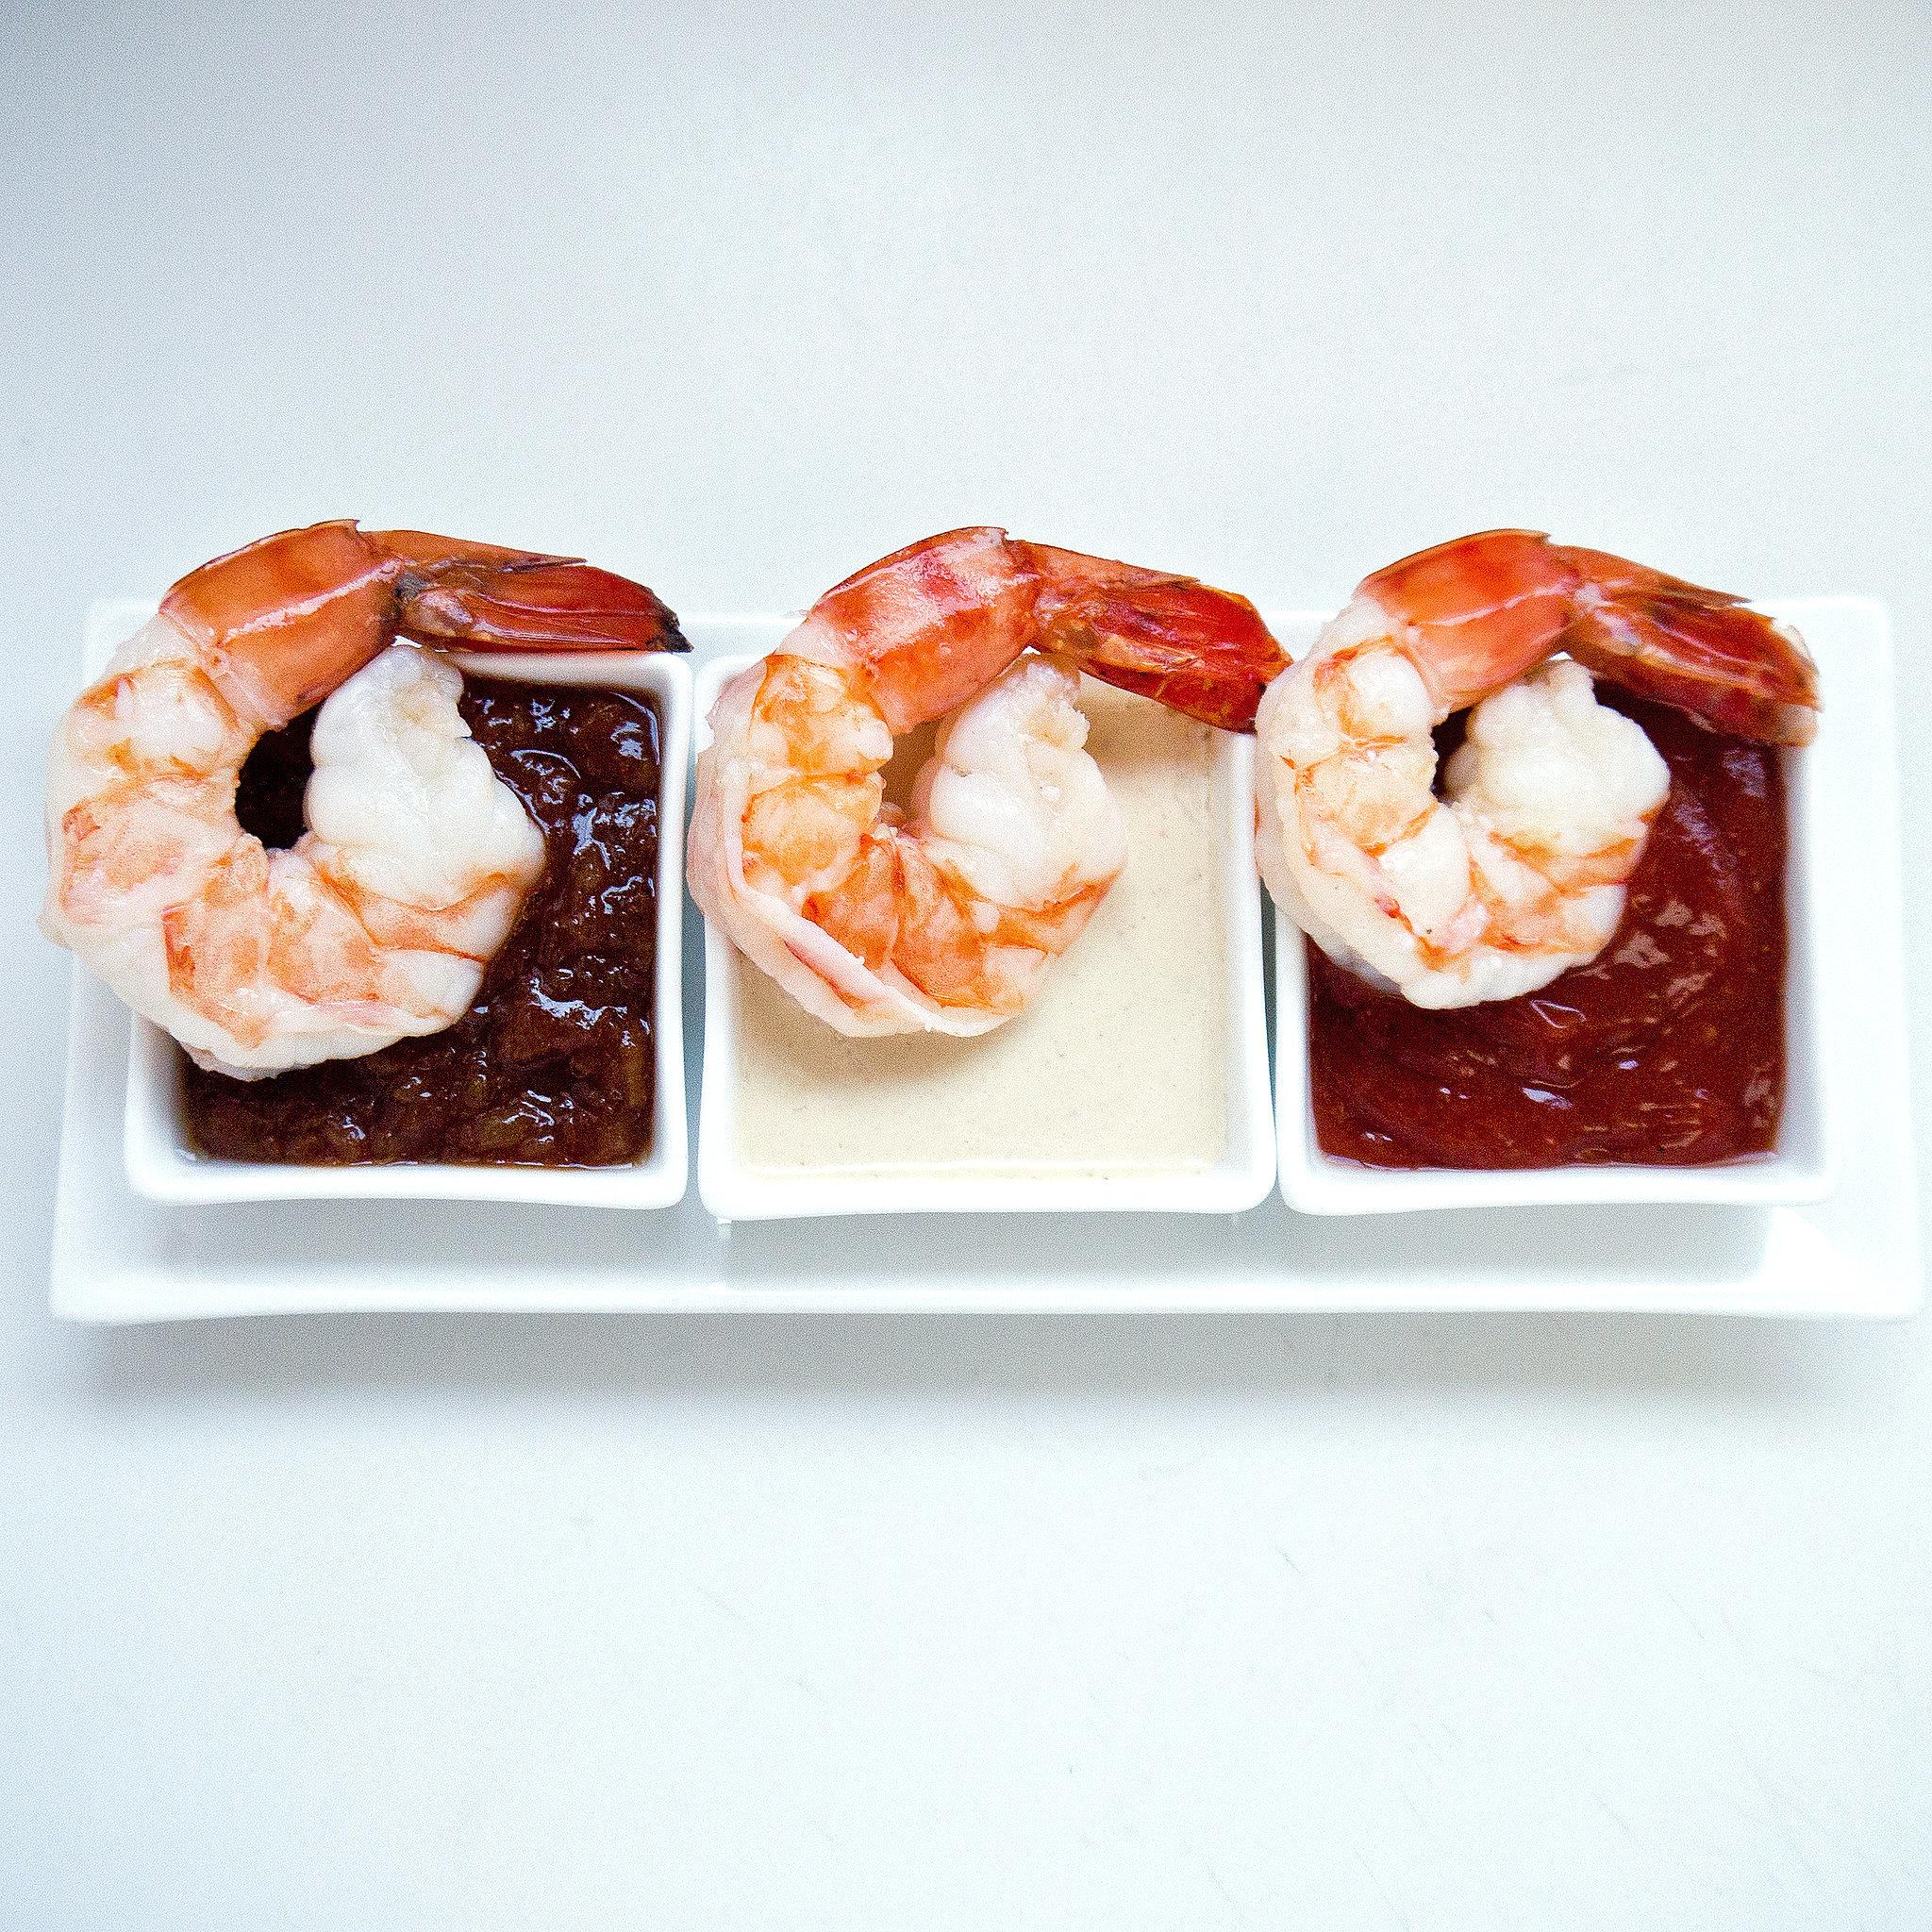 shrimp-cocktail dipping sauces — cocktail sauce, Thai peanut sauce ...